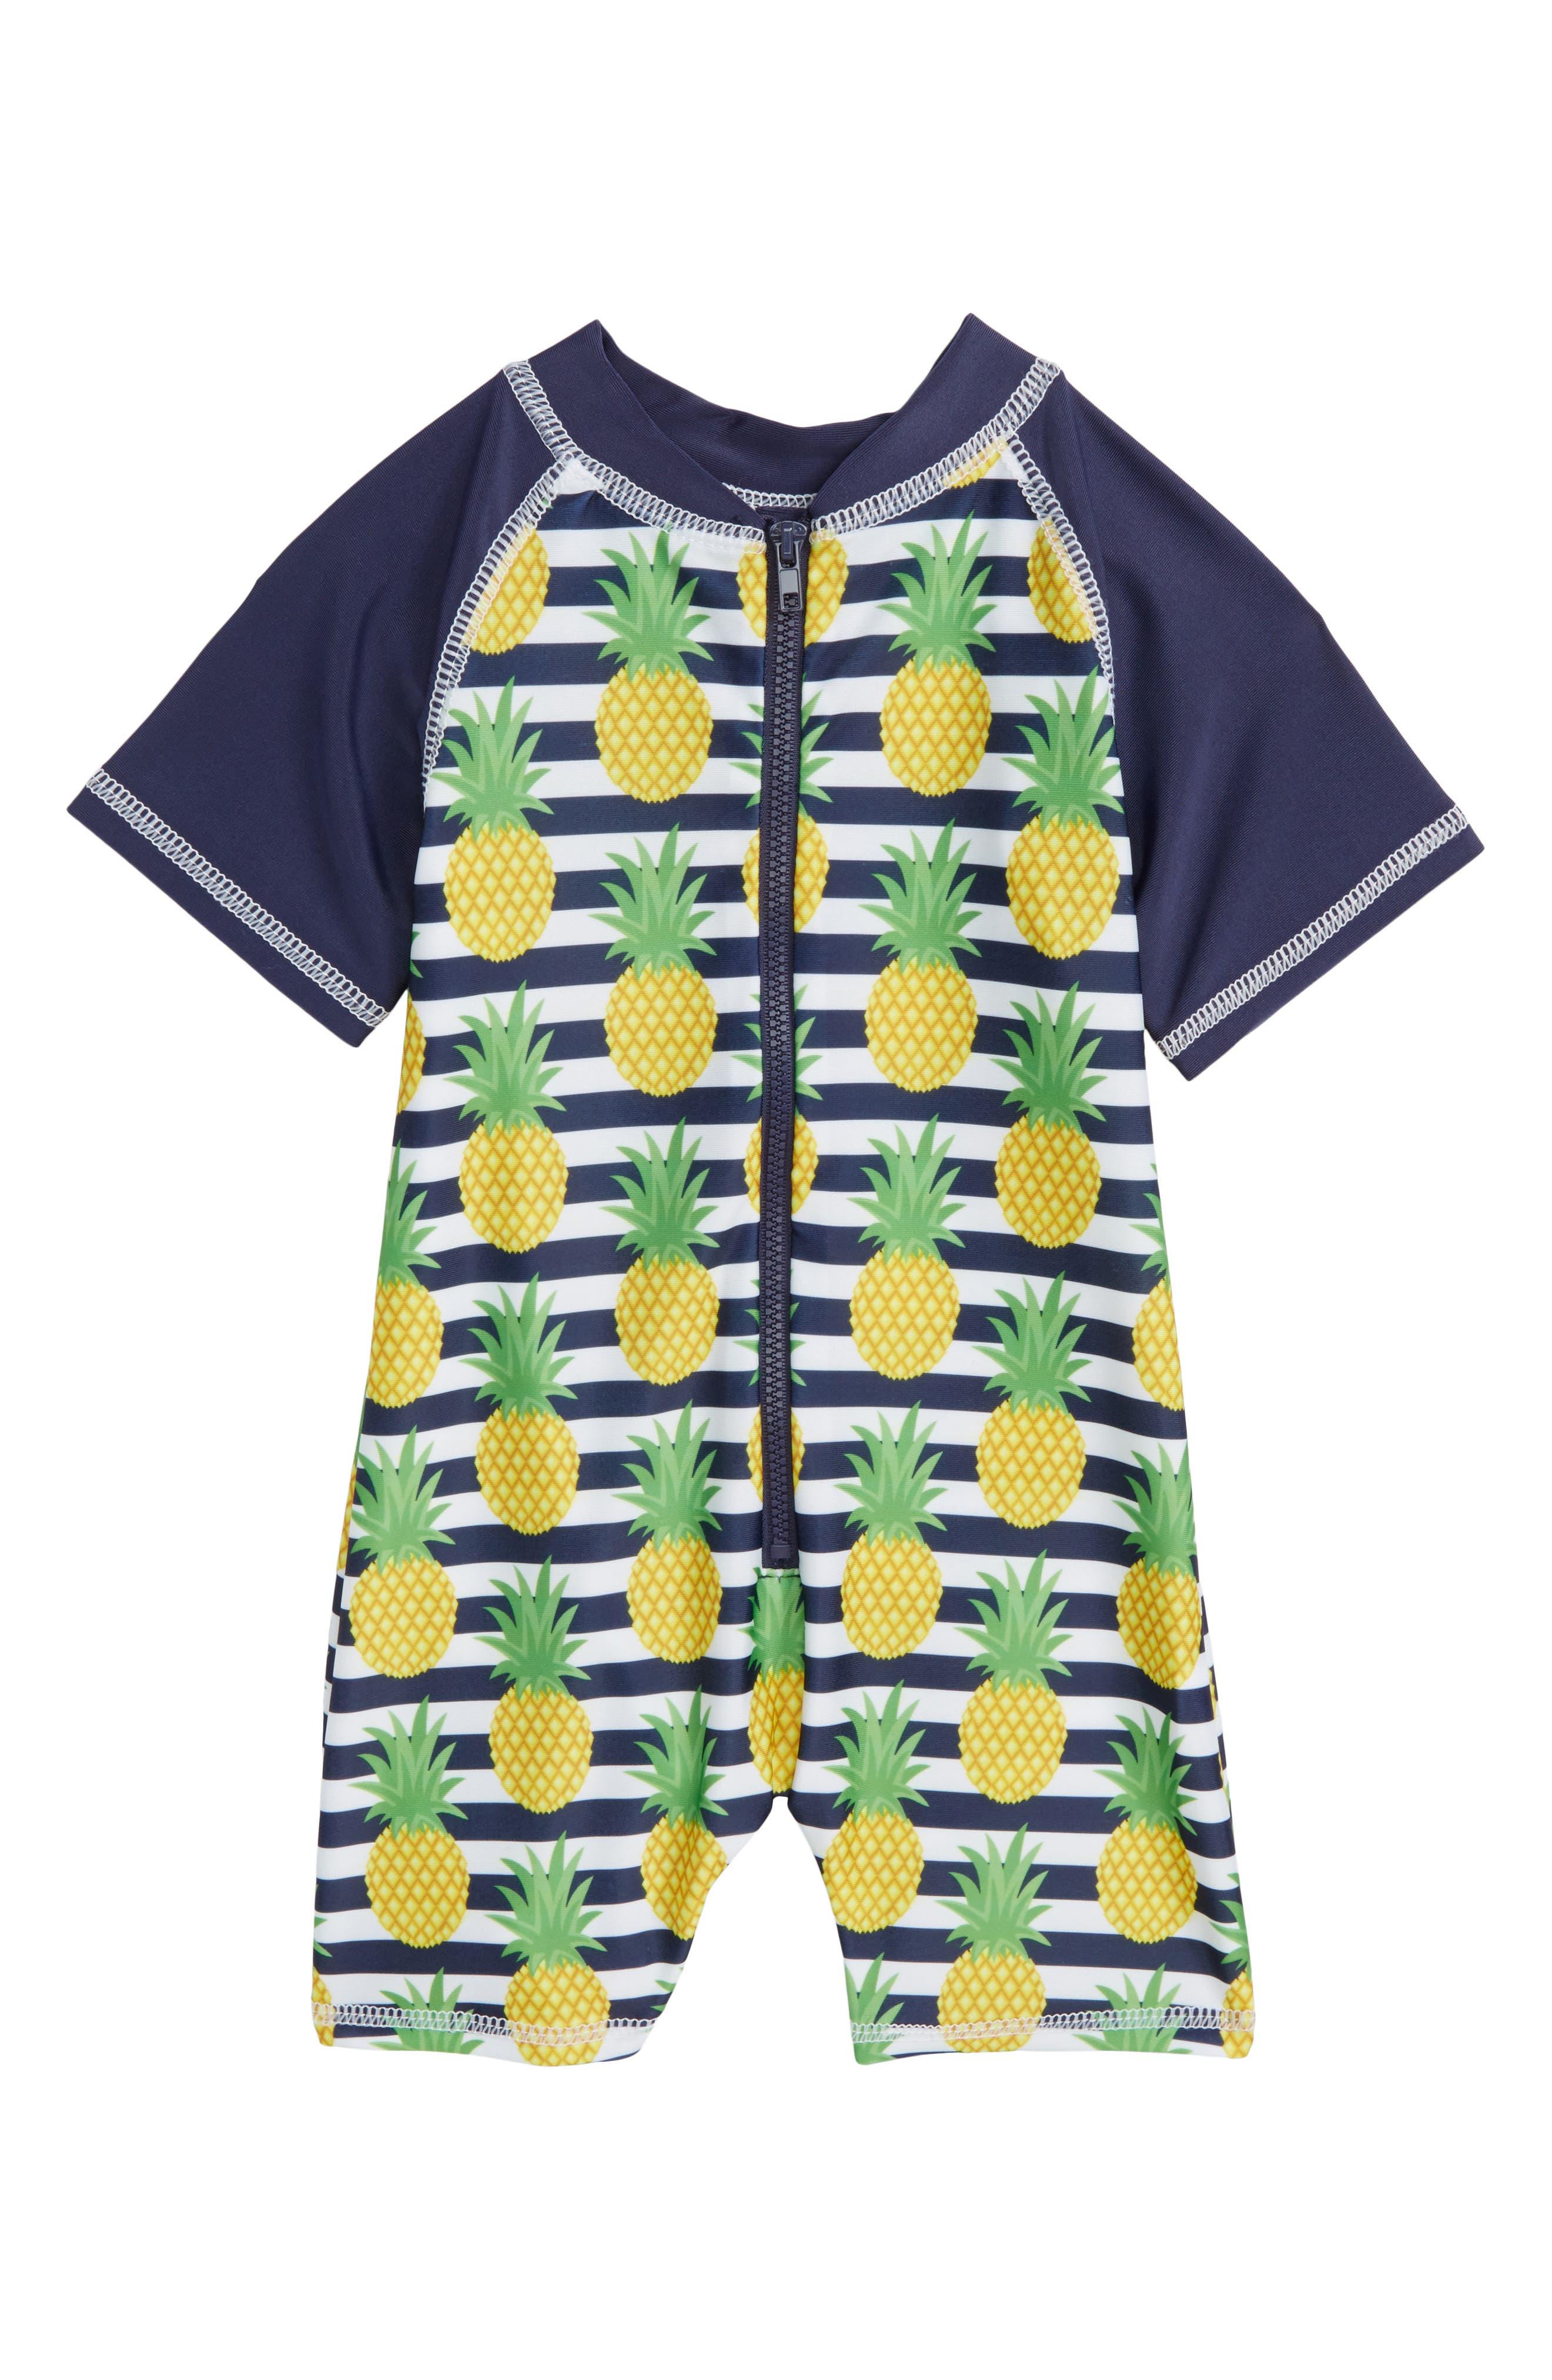 Preppy Pineapples One-Piece Rashguard Swimsuit,                             Main thumbnail 1, color,                             Blue Multi